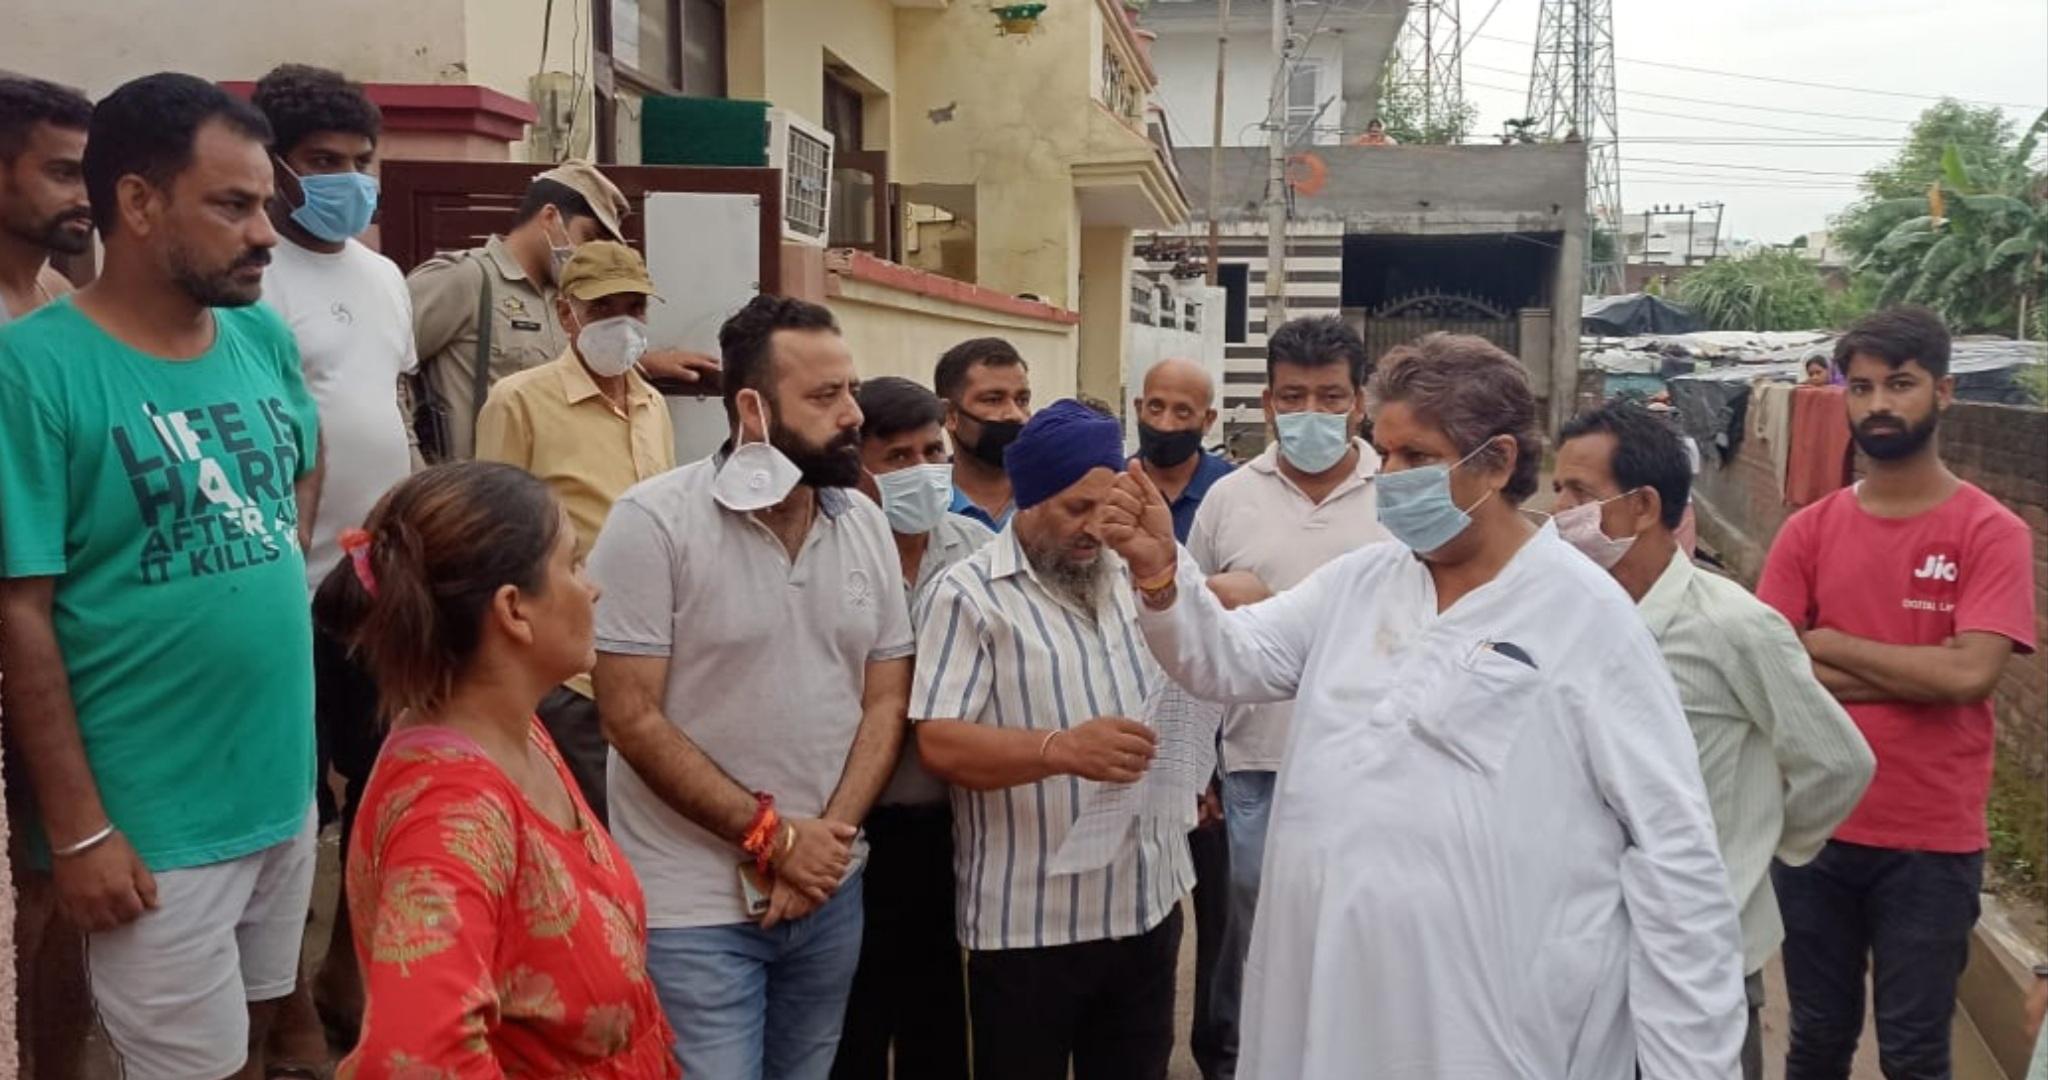 Senior Congress leader, Raman Bhalla interacting with locals of Ambedkar Nagar in Jammu on Tuesday.